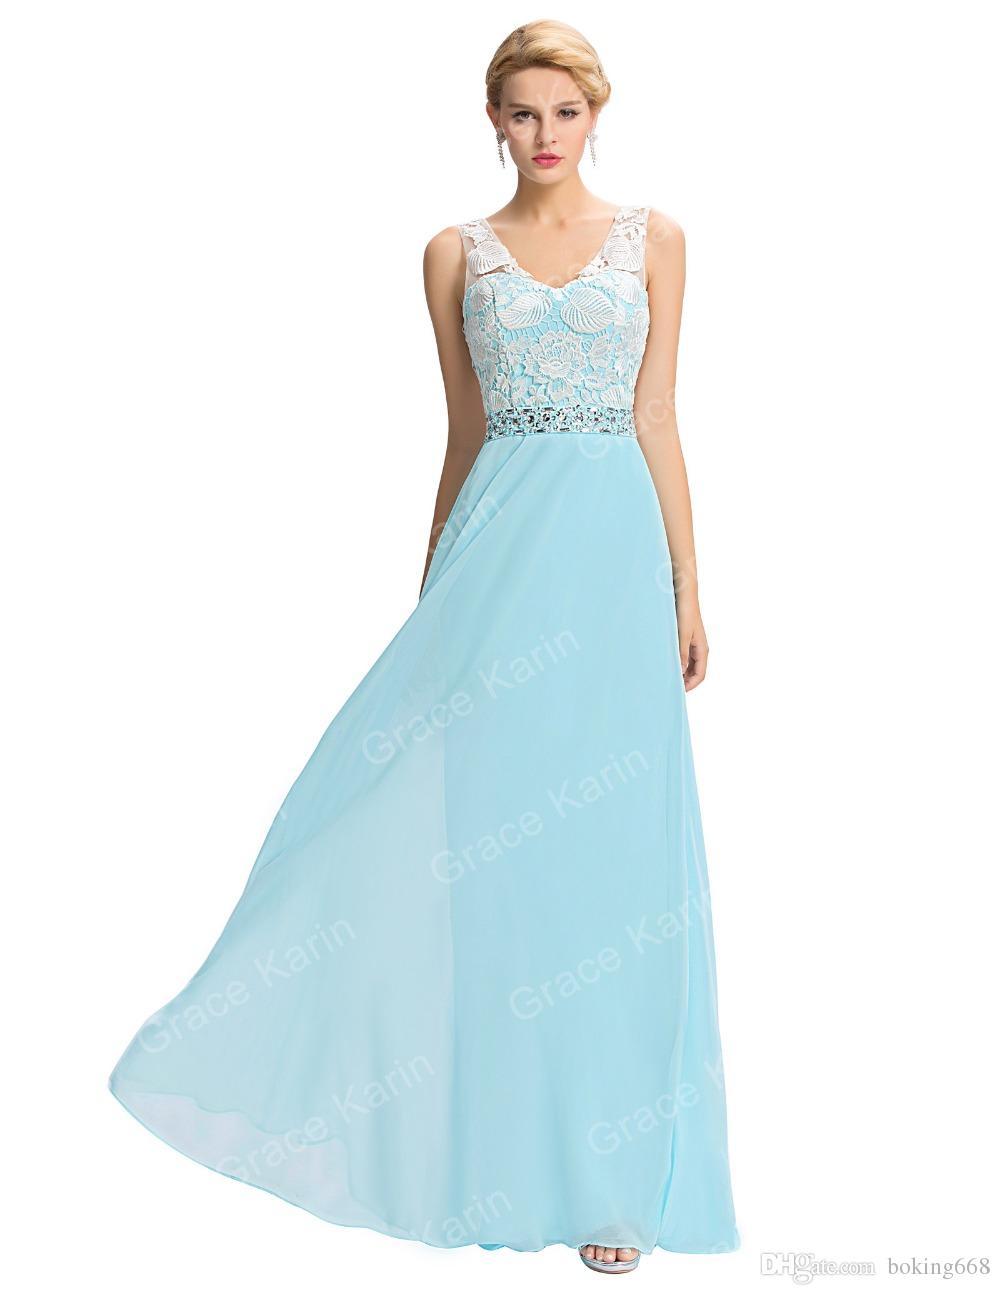 Dorable Indie Prom Dresses Motif - All Wedding Dresses ...